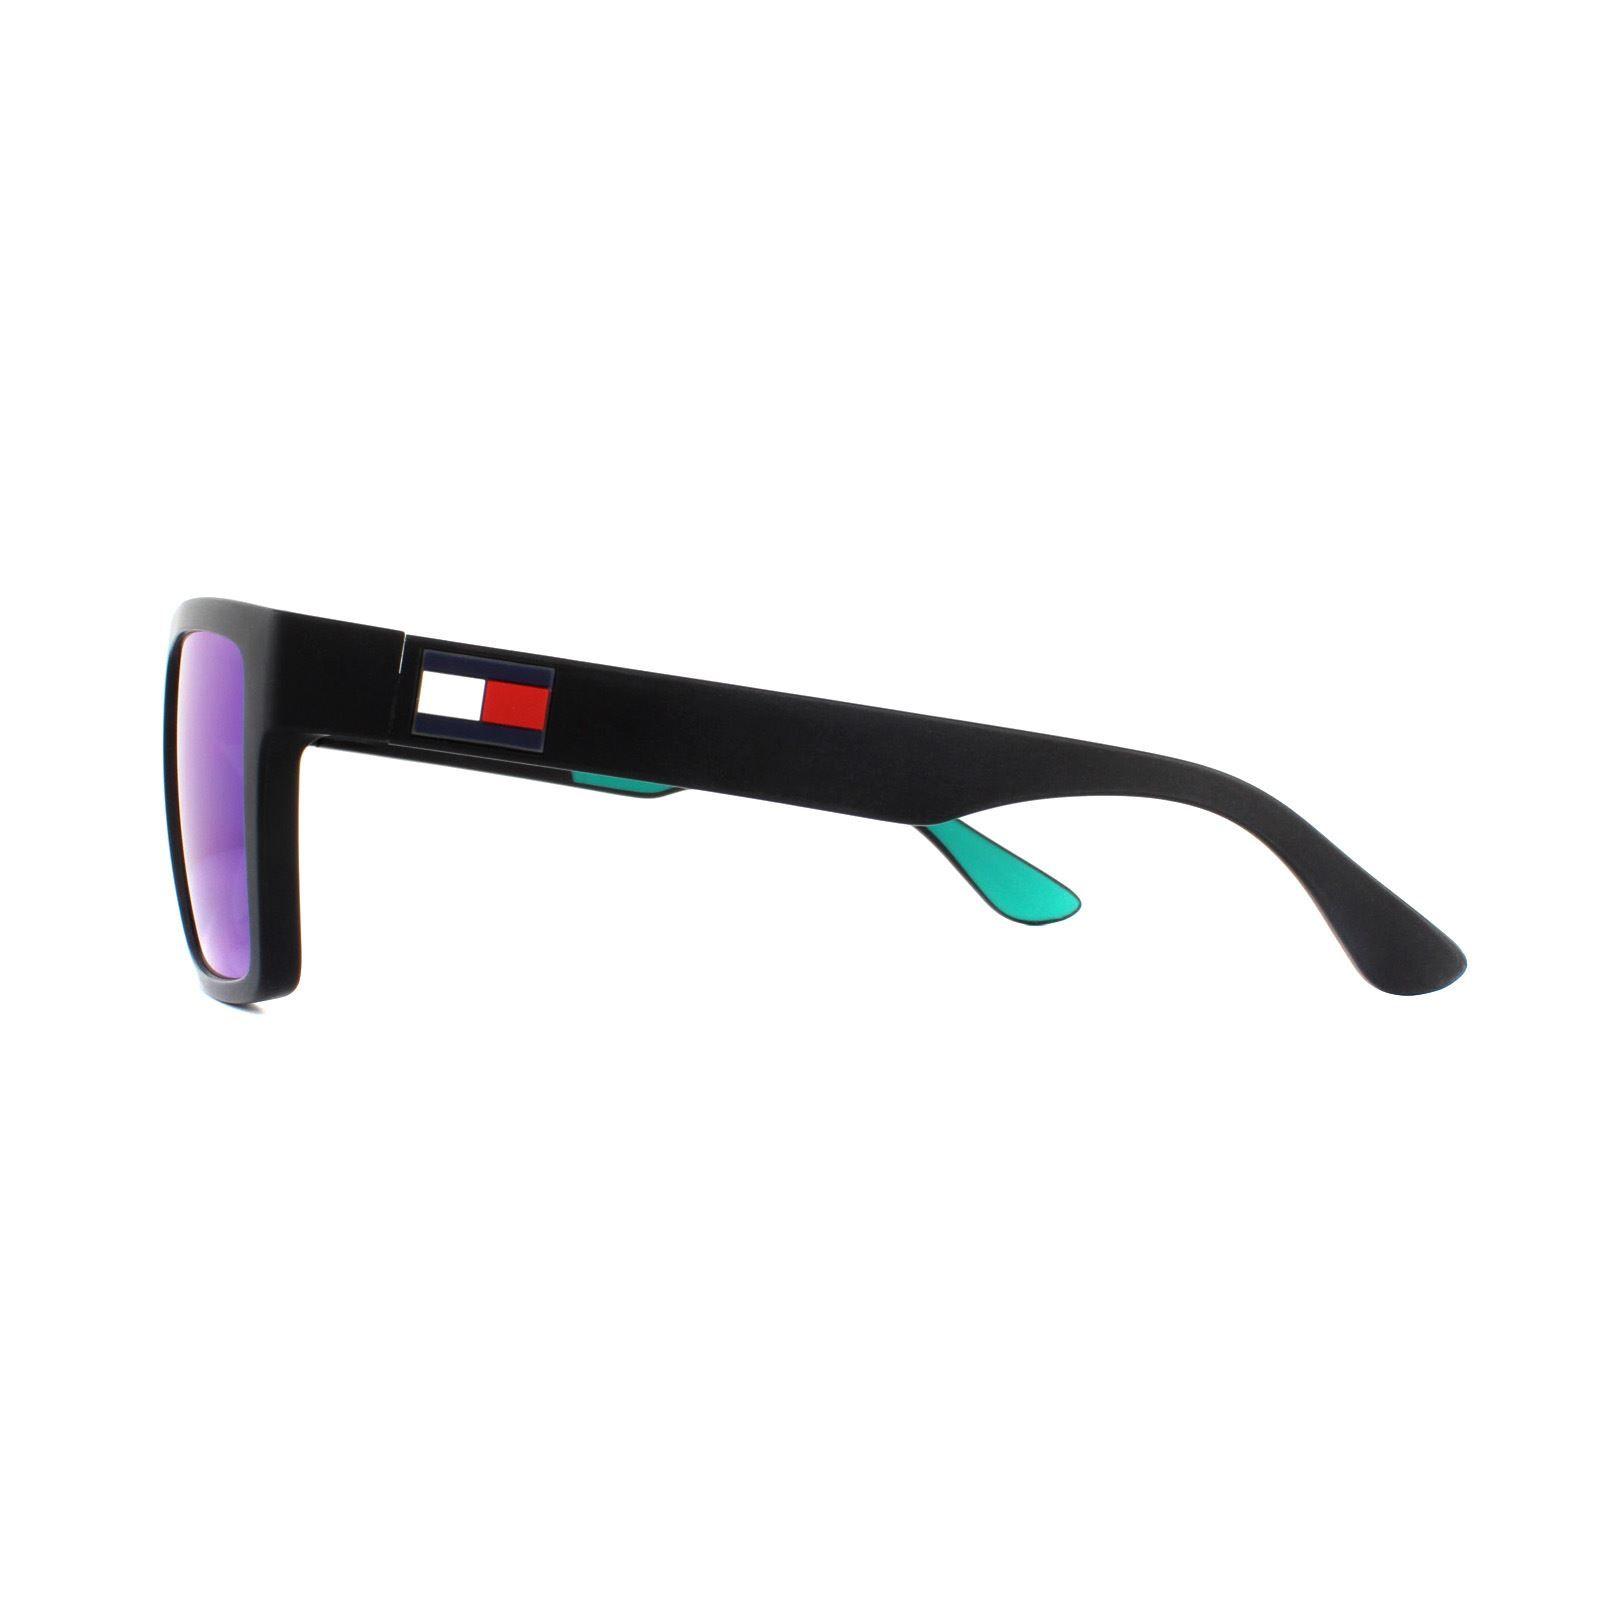 Tommy Hilfiger Sunglasses Th 1605/S 3Ol Z9 Black Green Mirror